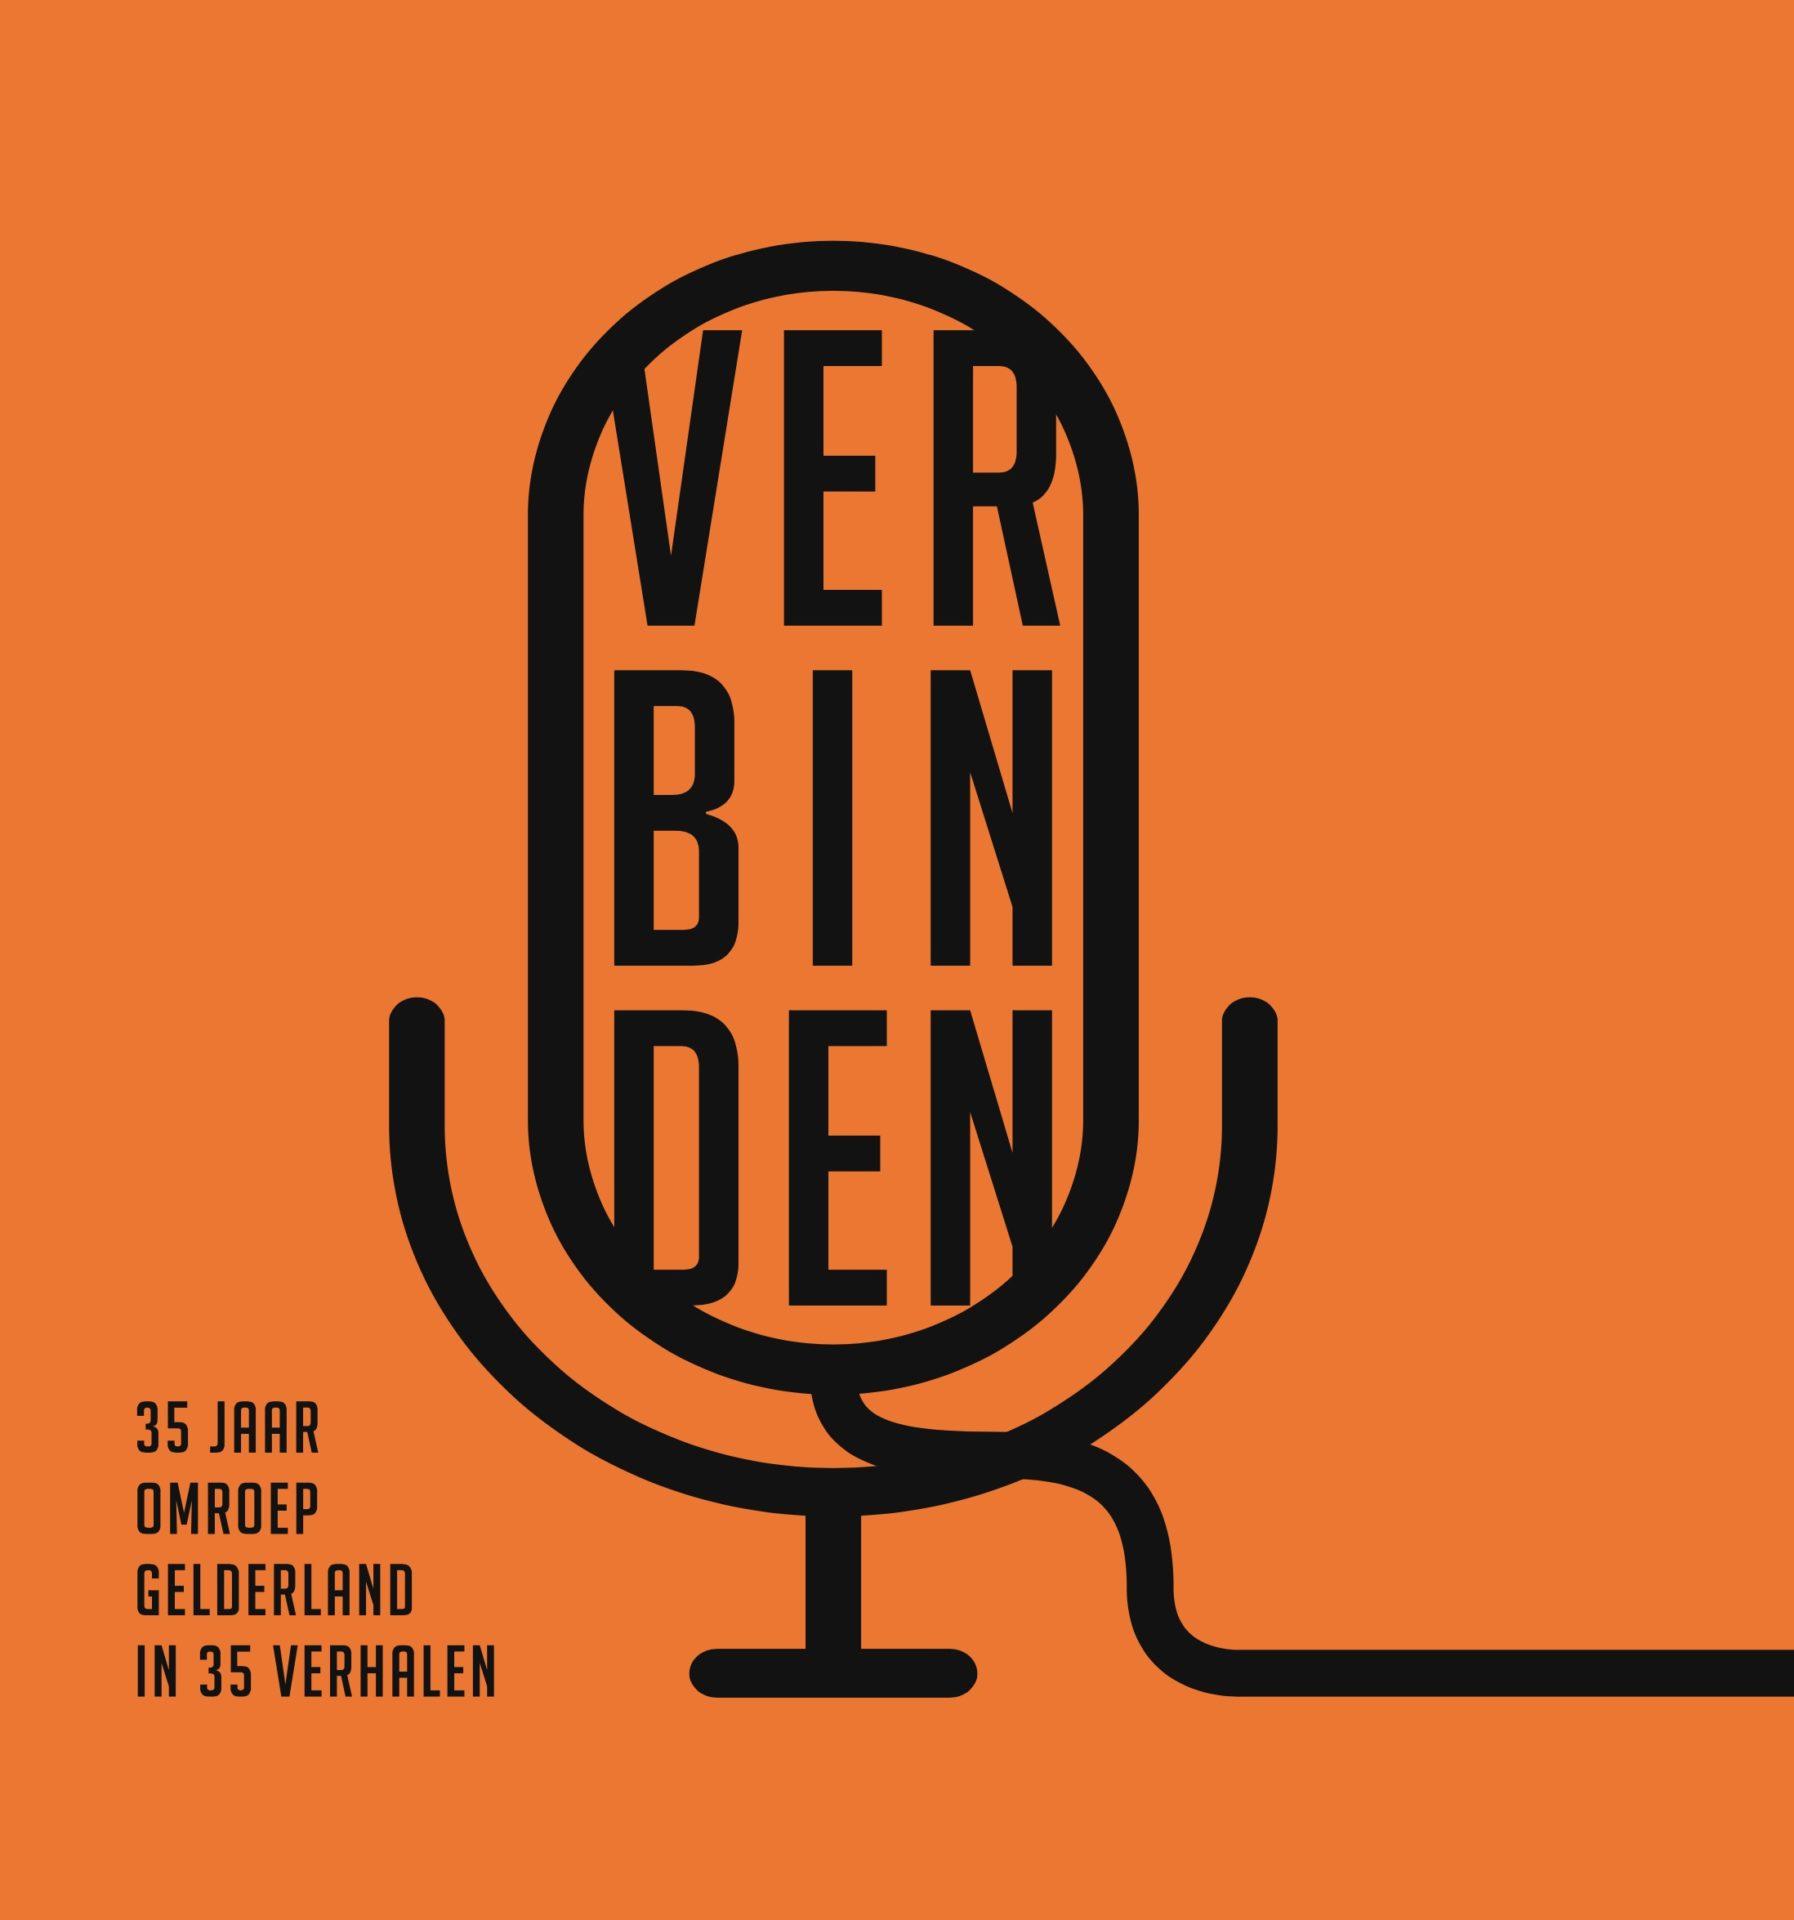 Jubileumboek voor Omroep Gelderland